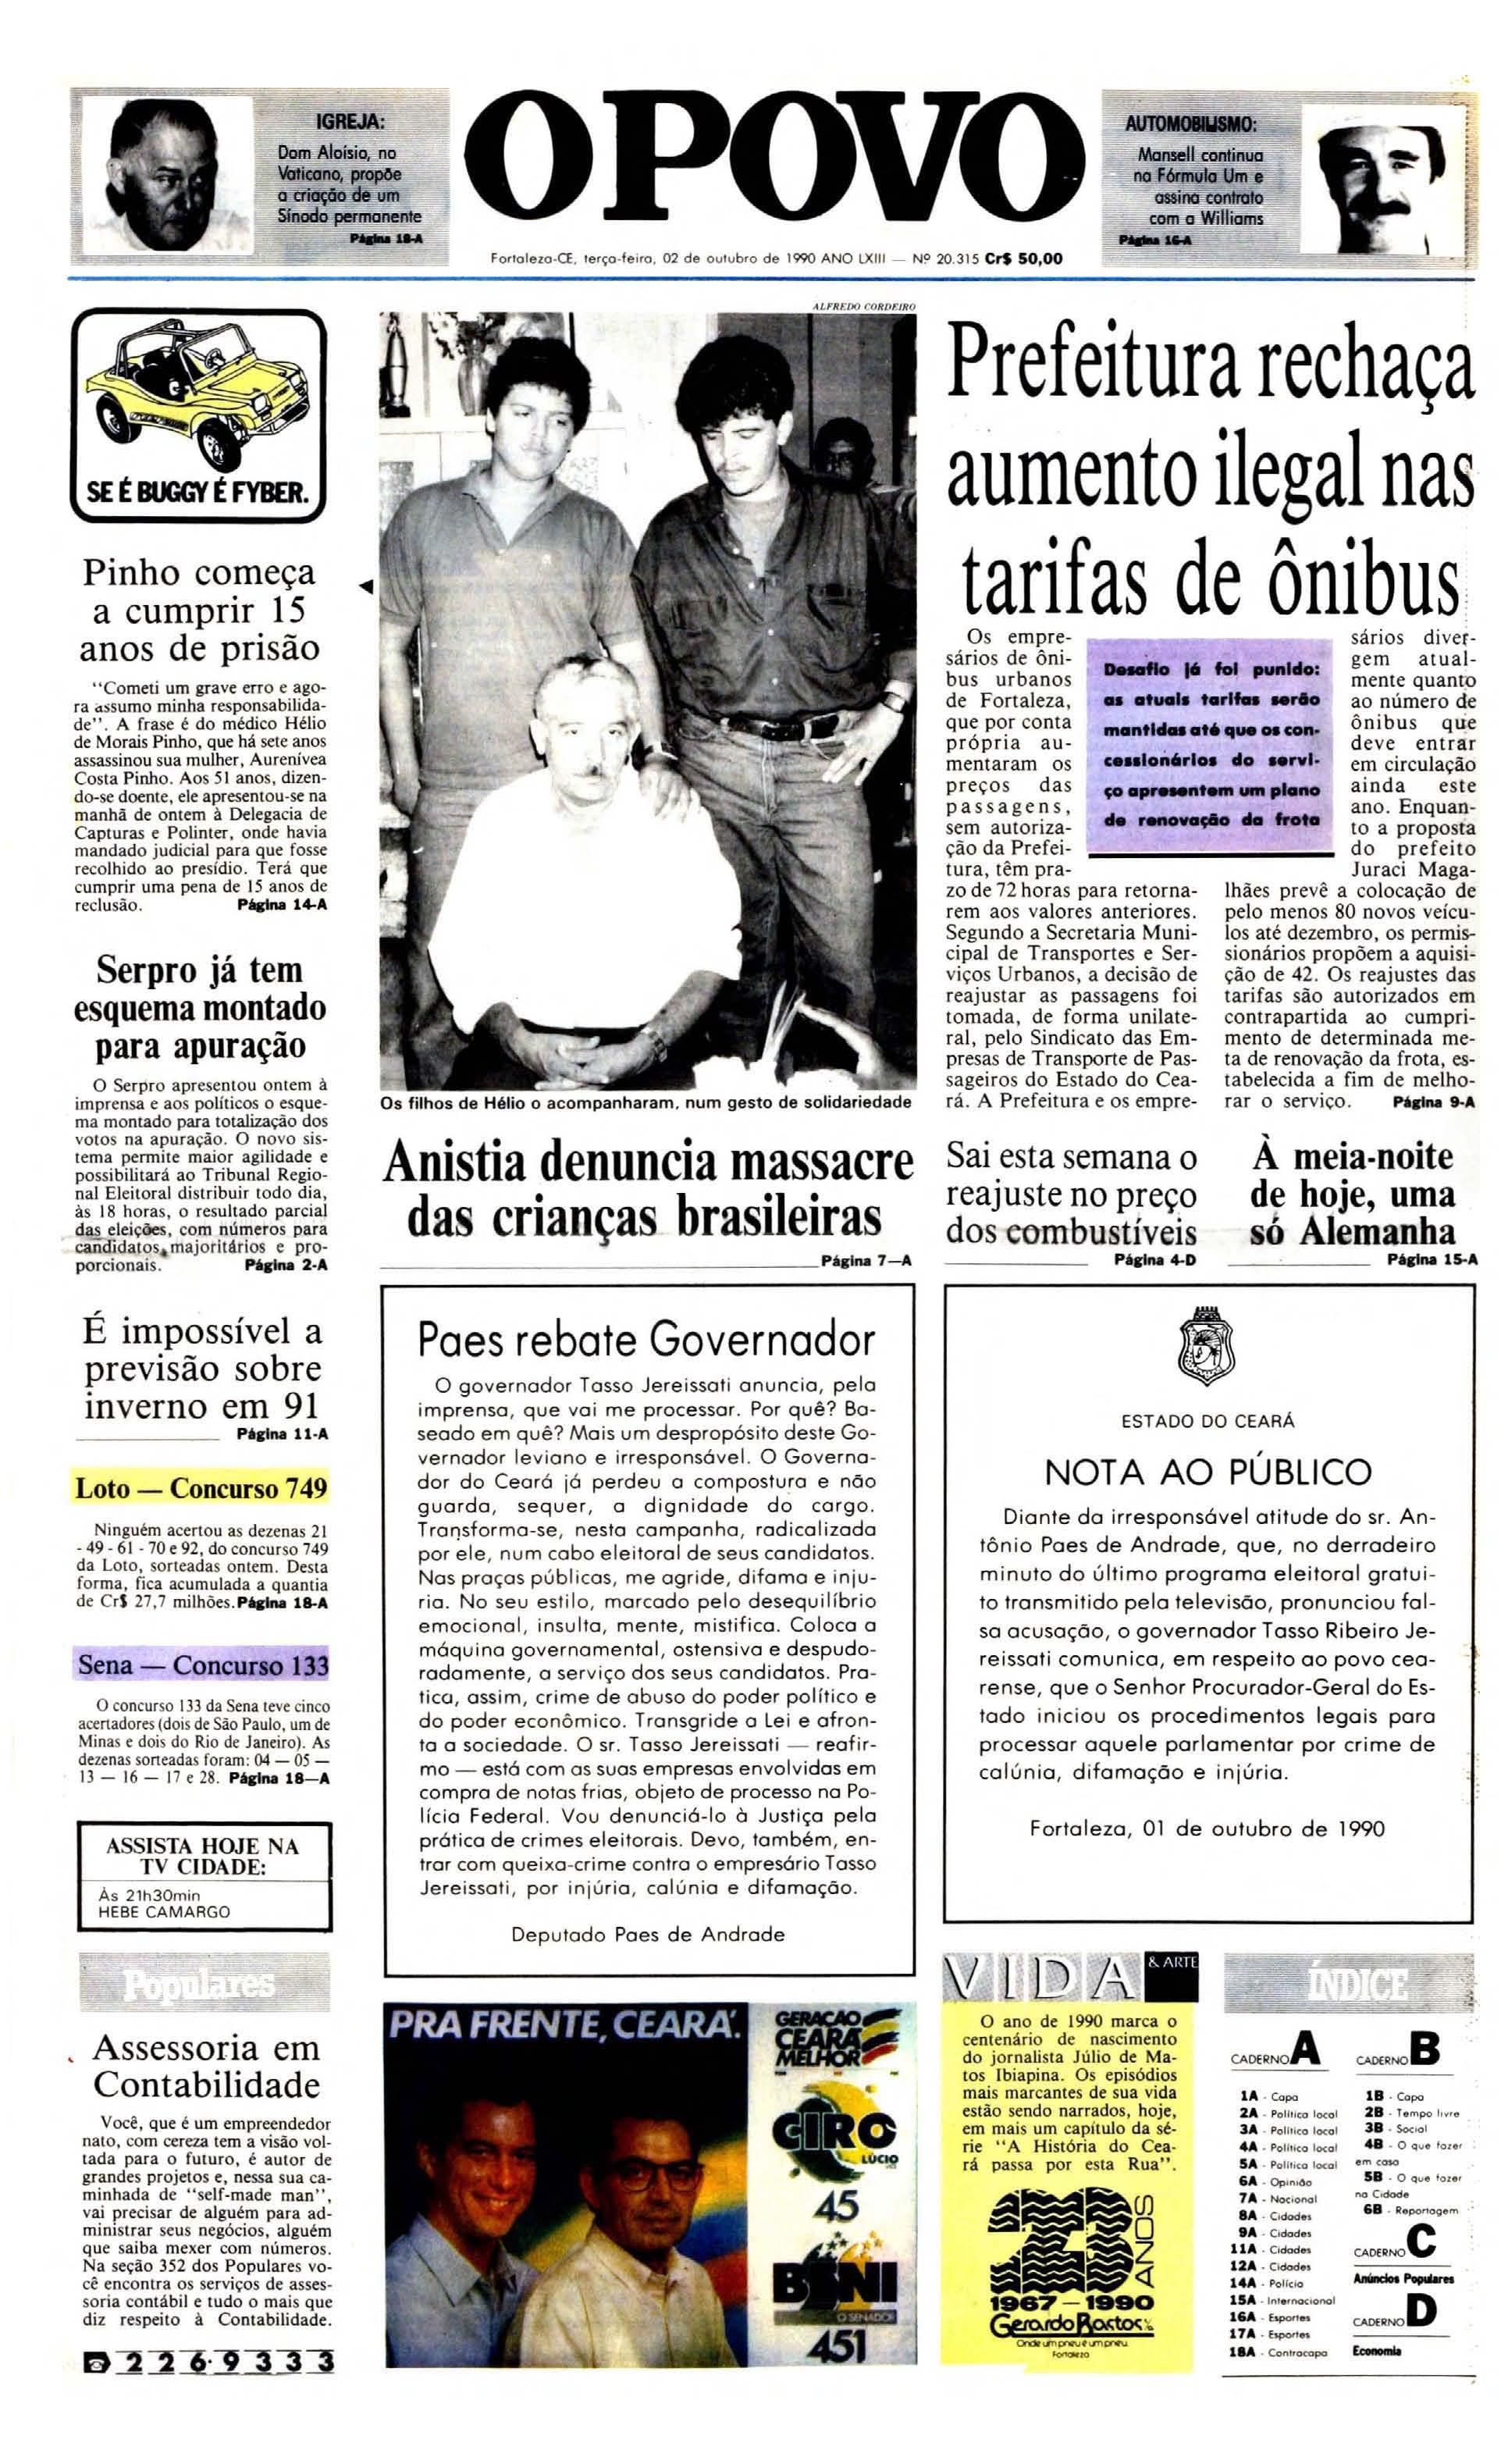 02-10-1990